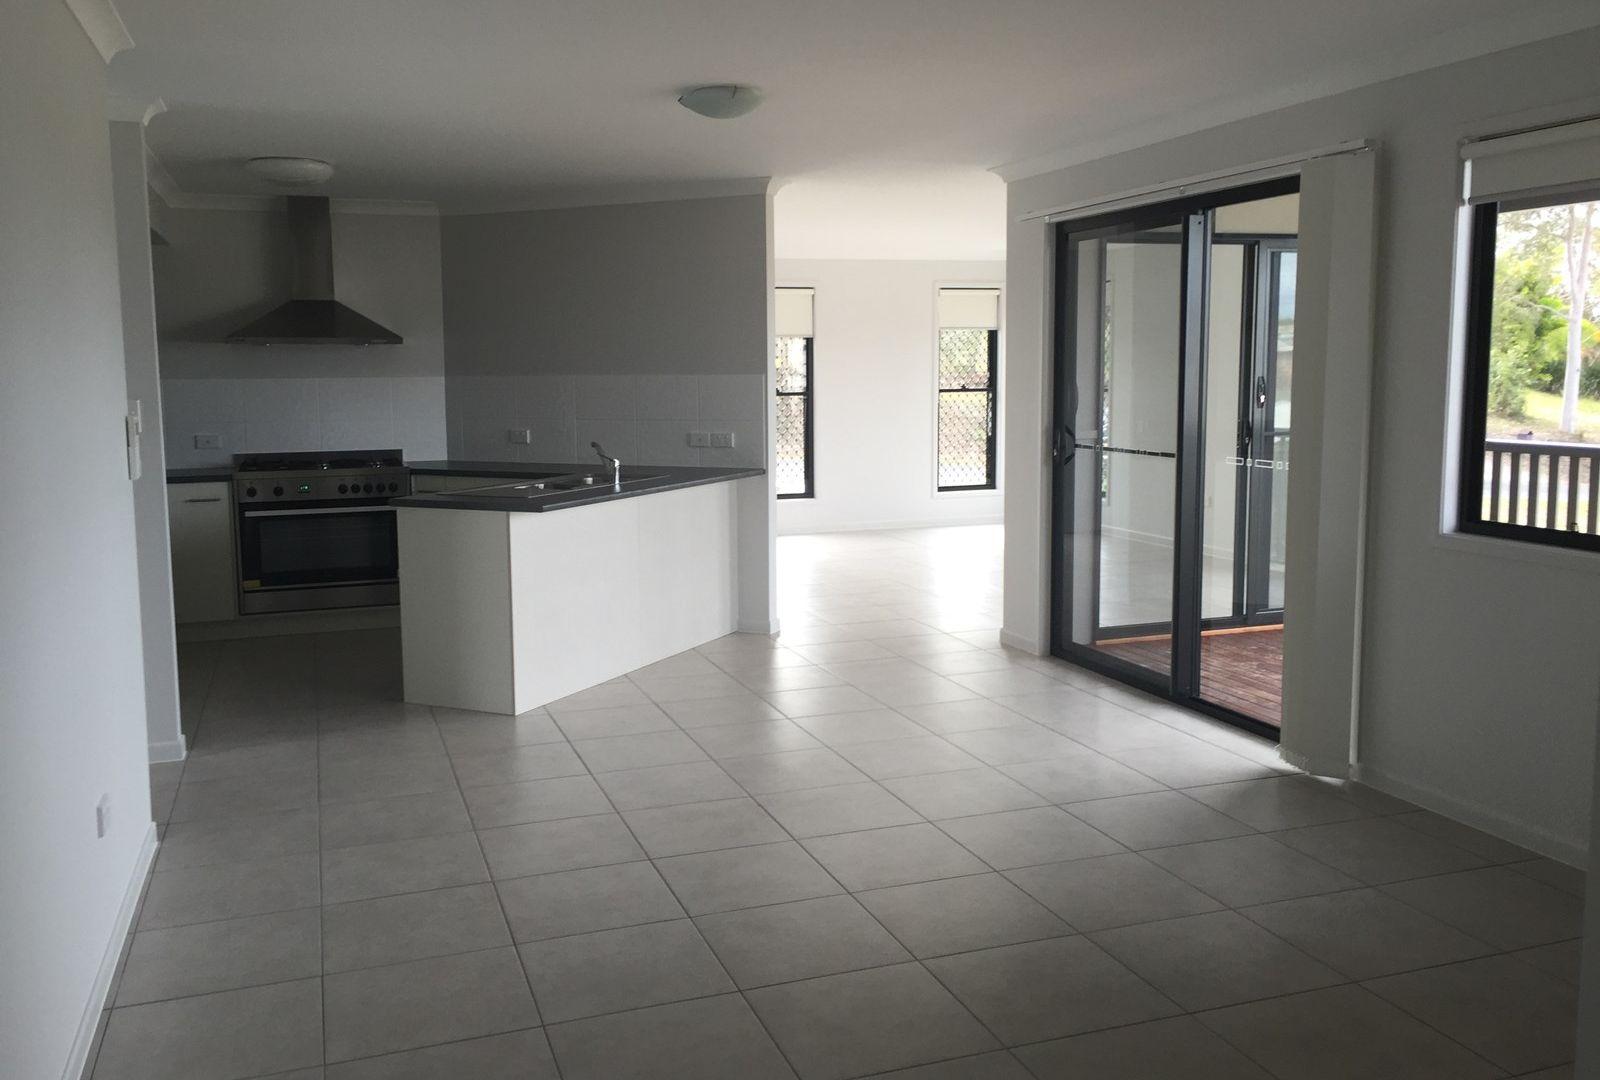 27 Lillis Road, Gympie QLD 4570, Image 2